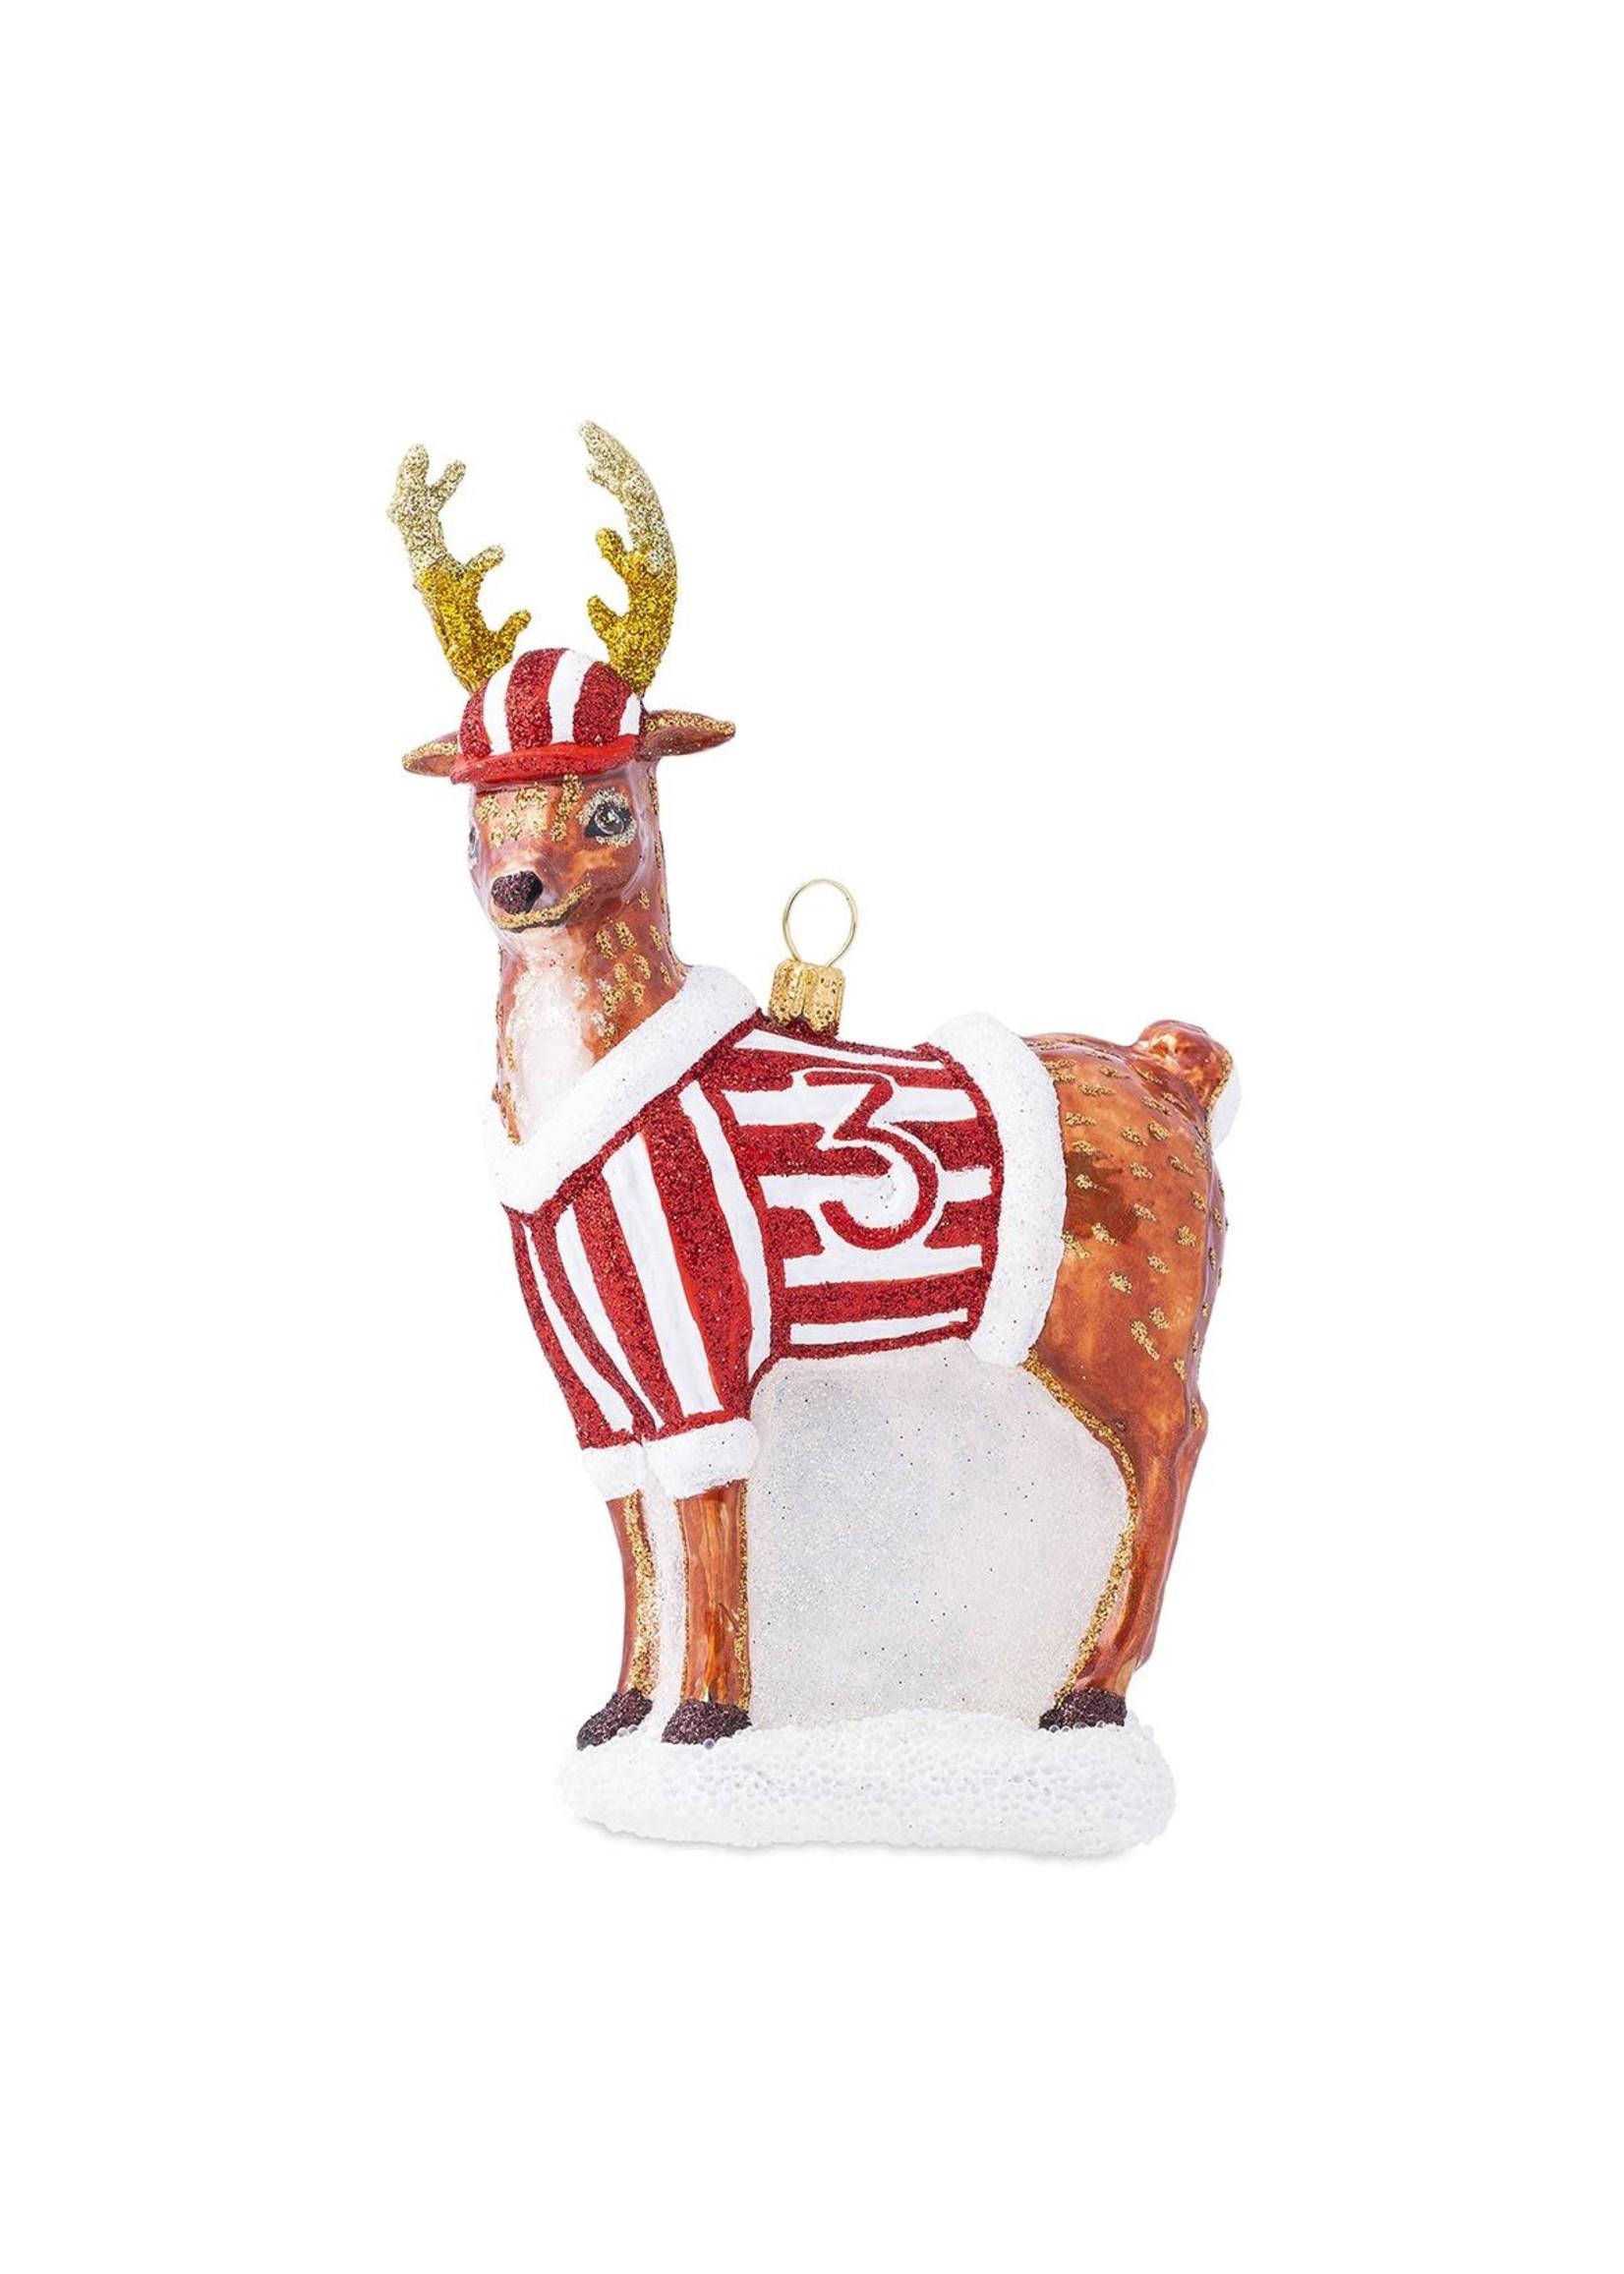 Juliska Ornament - Donner the Reindeer